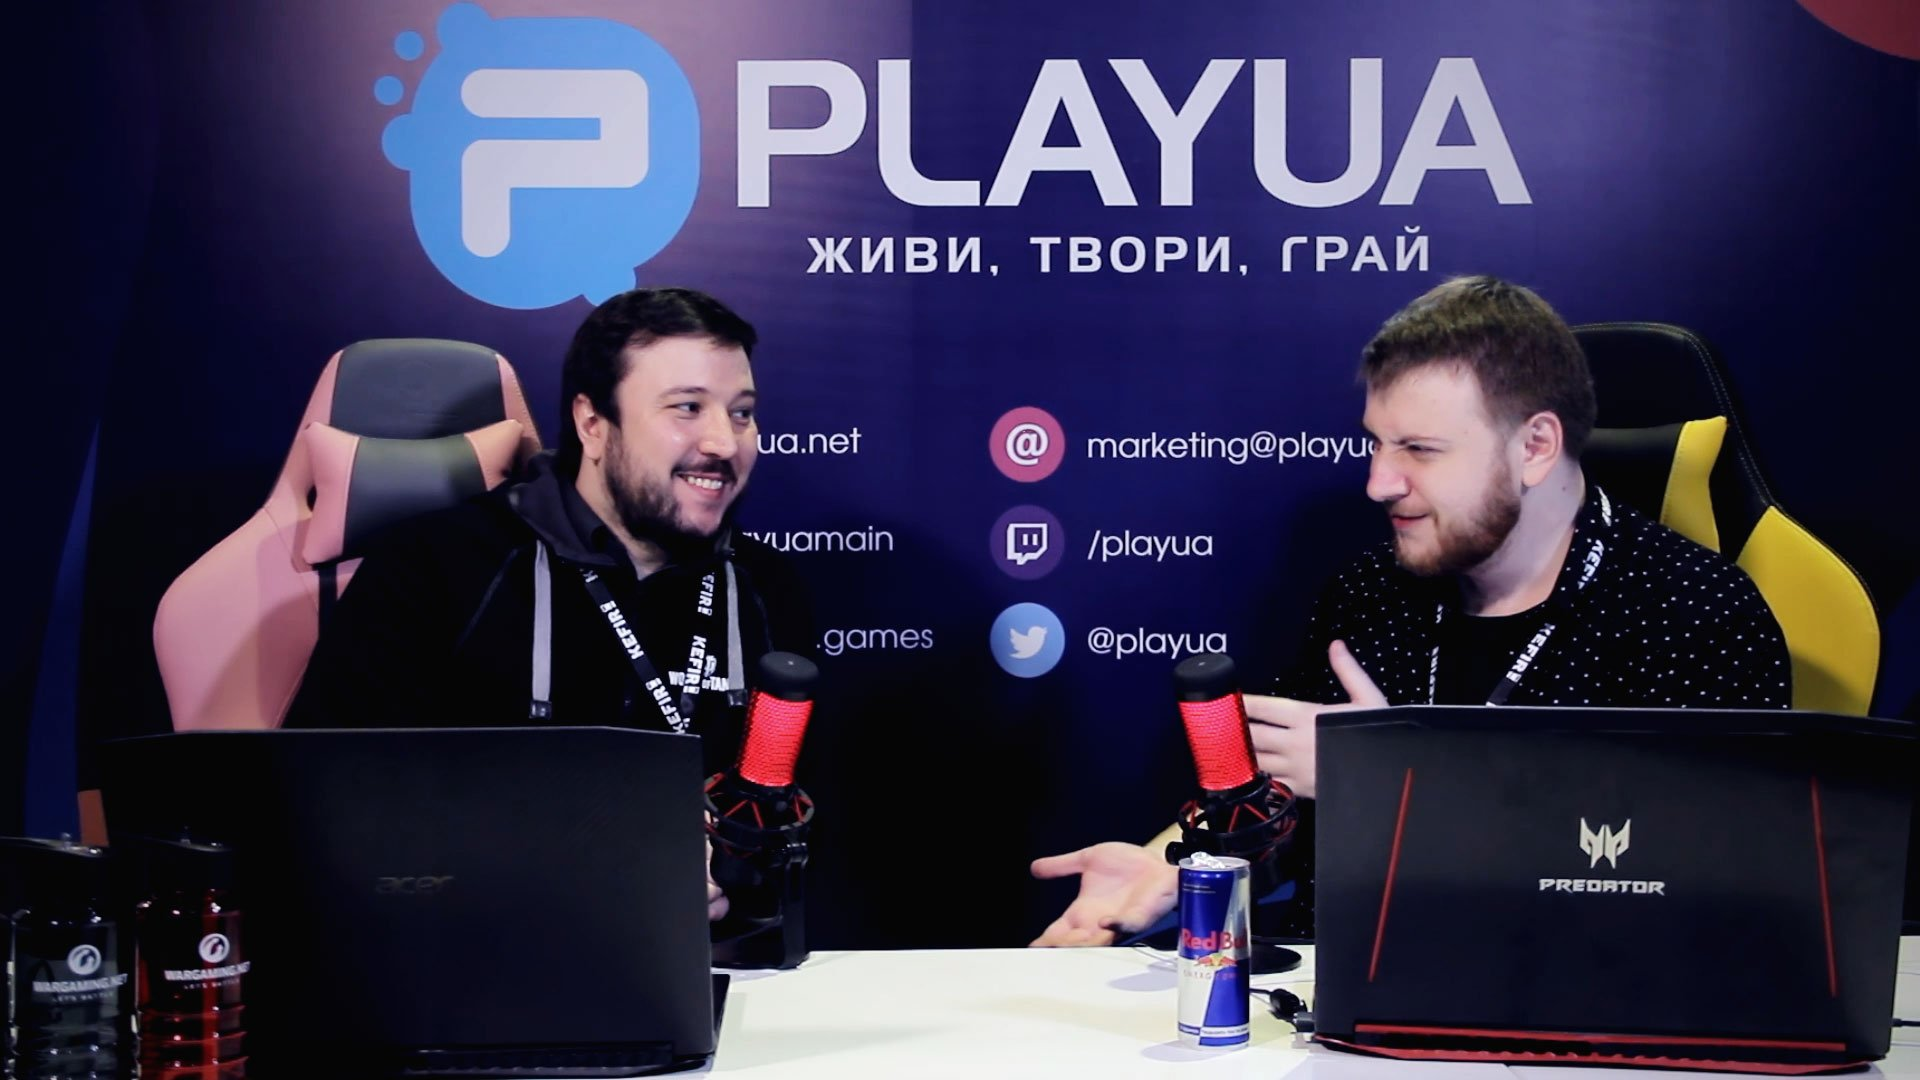 World of Tanks. Pagan Online. Wargaming / Інтерв'ю з Дмитром Великоіваненко (Games Gathering 2018)